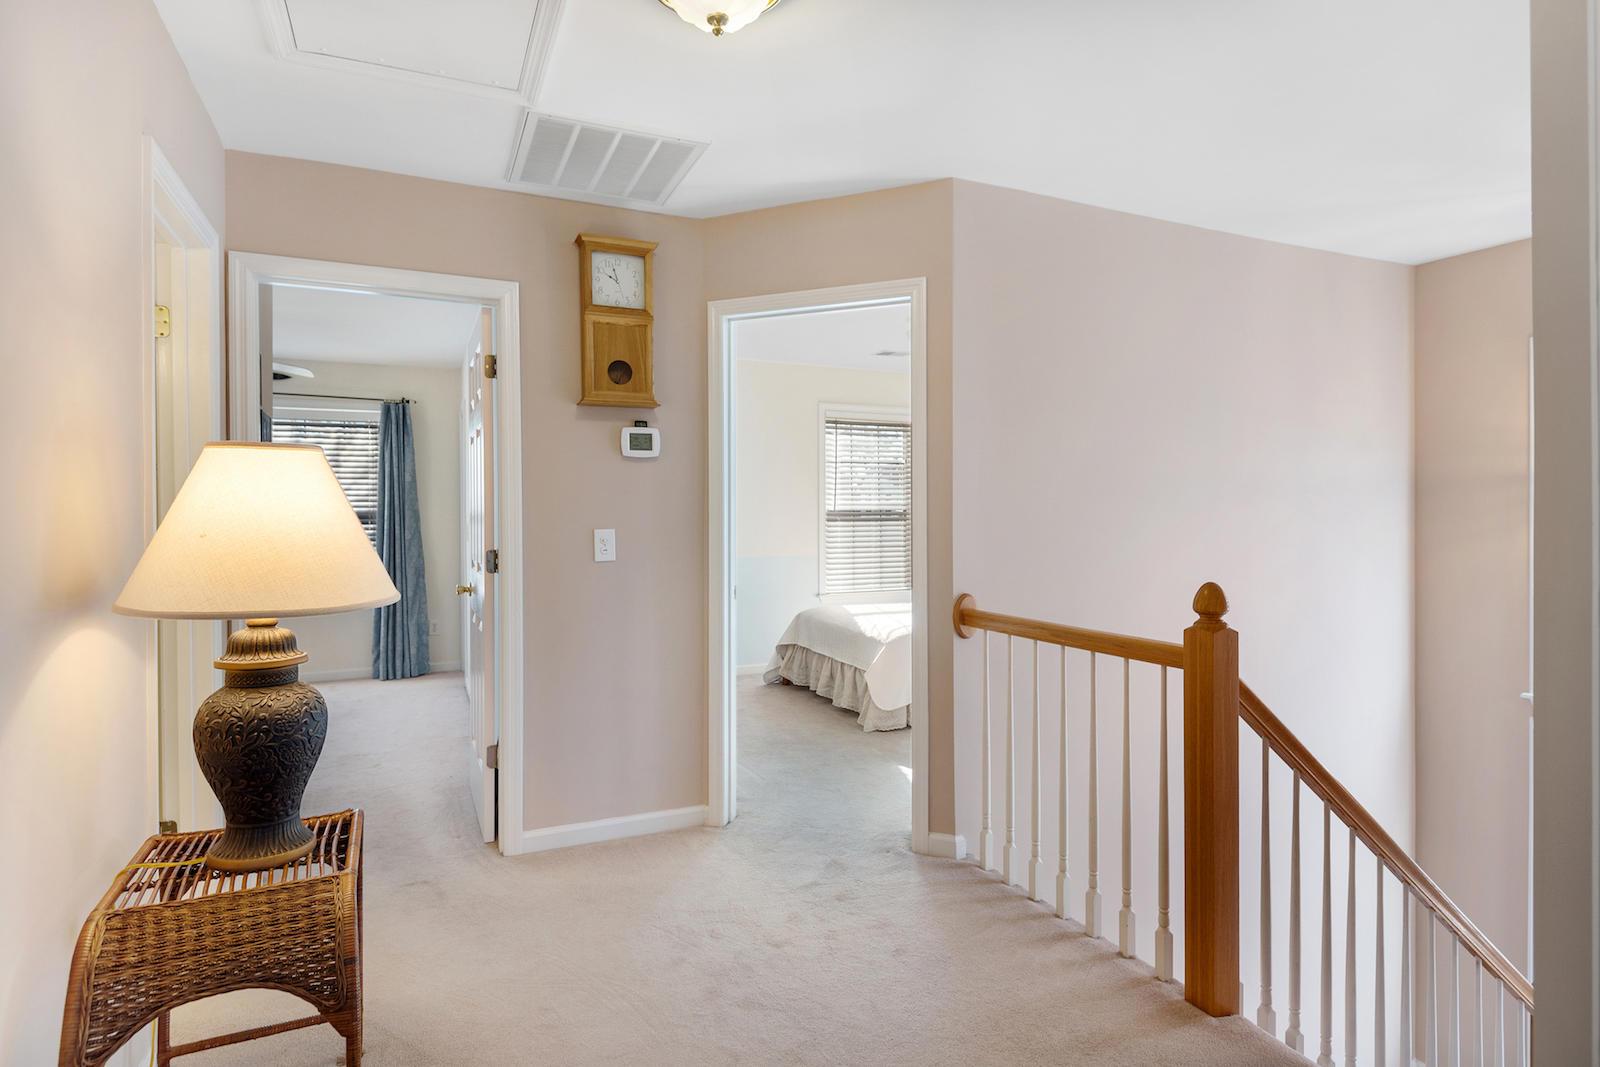 Belle Hall Homes For Sale - 195 Revetment, Mount Pleasant, SC - 11